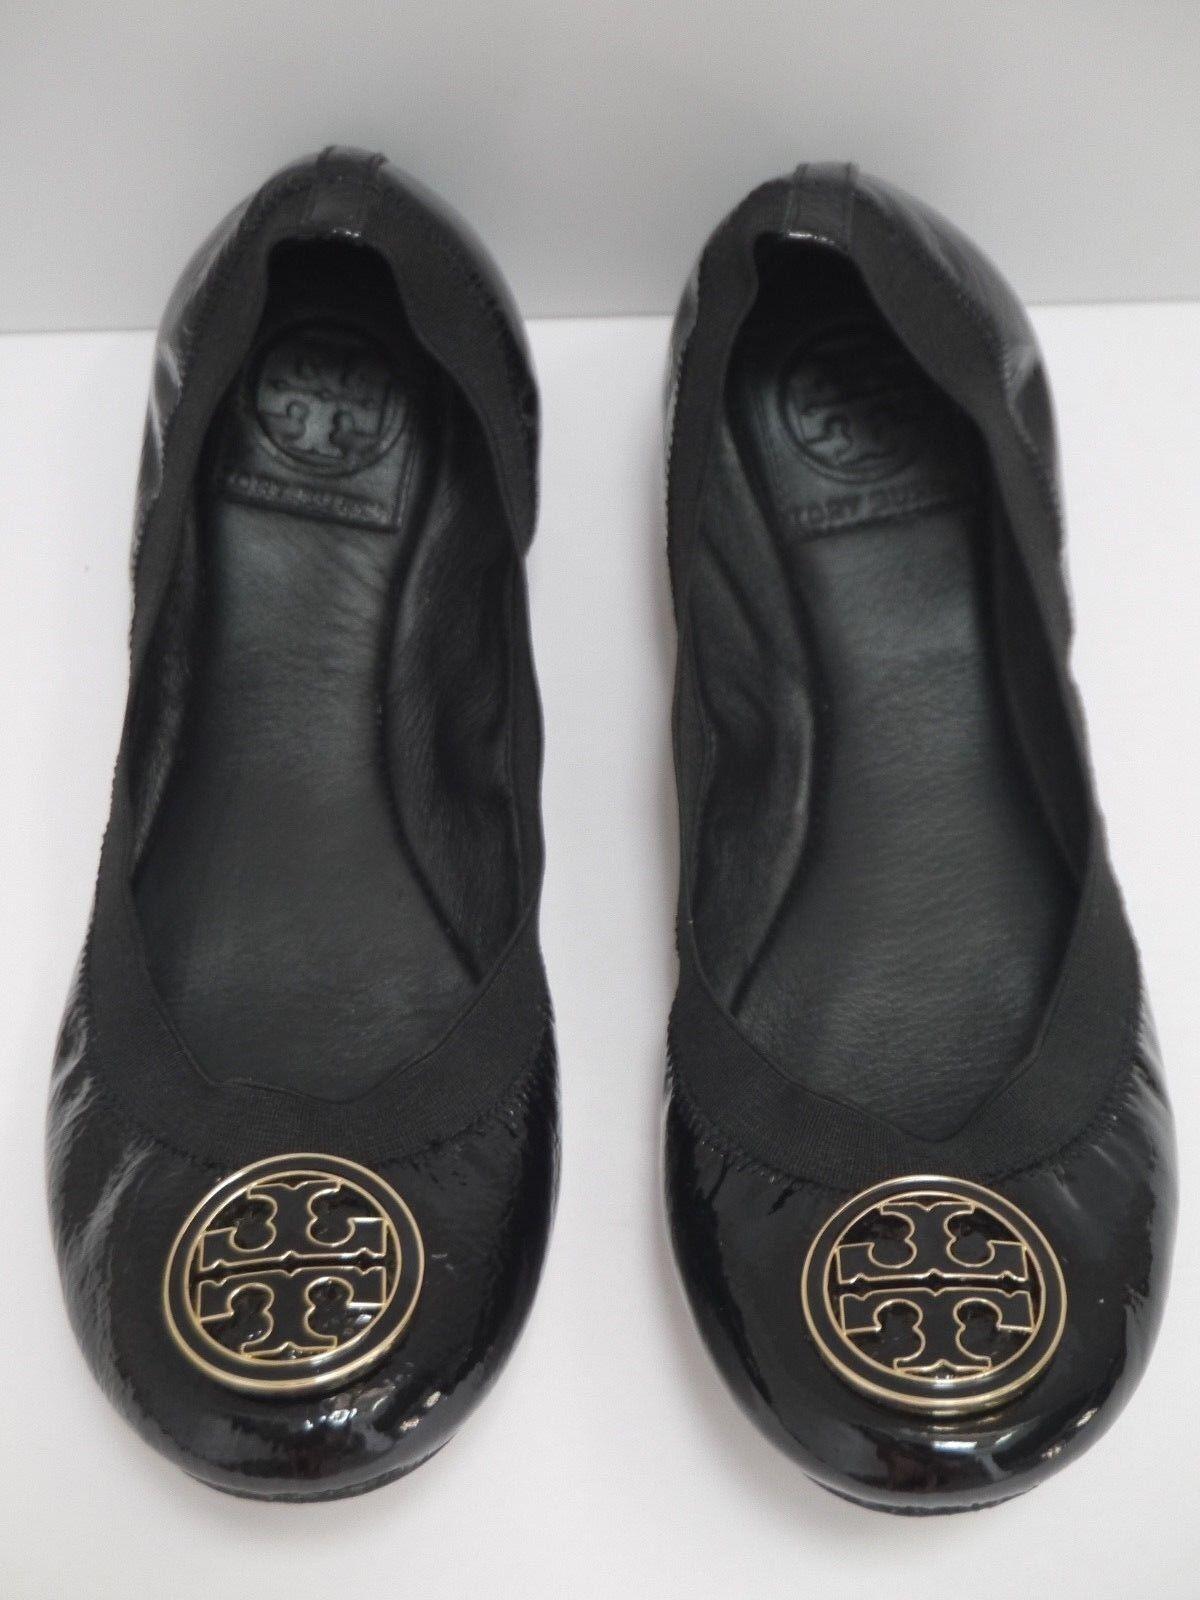 TORY BURCH Caroline black patent leather logo toe detail ballet flats size 8 M